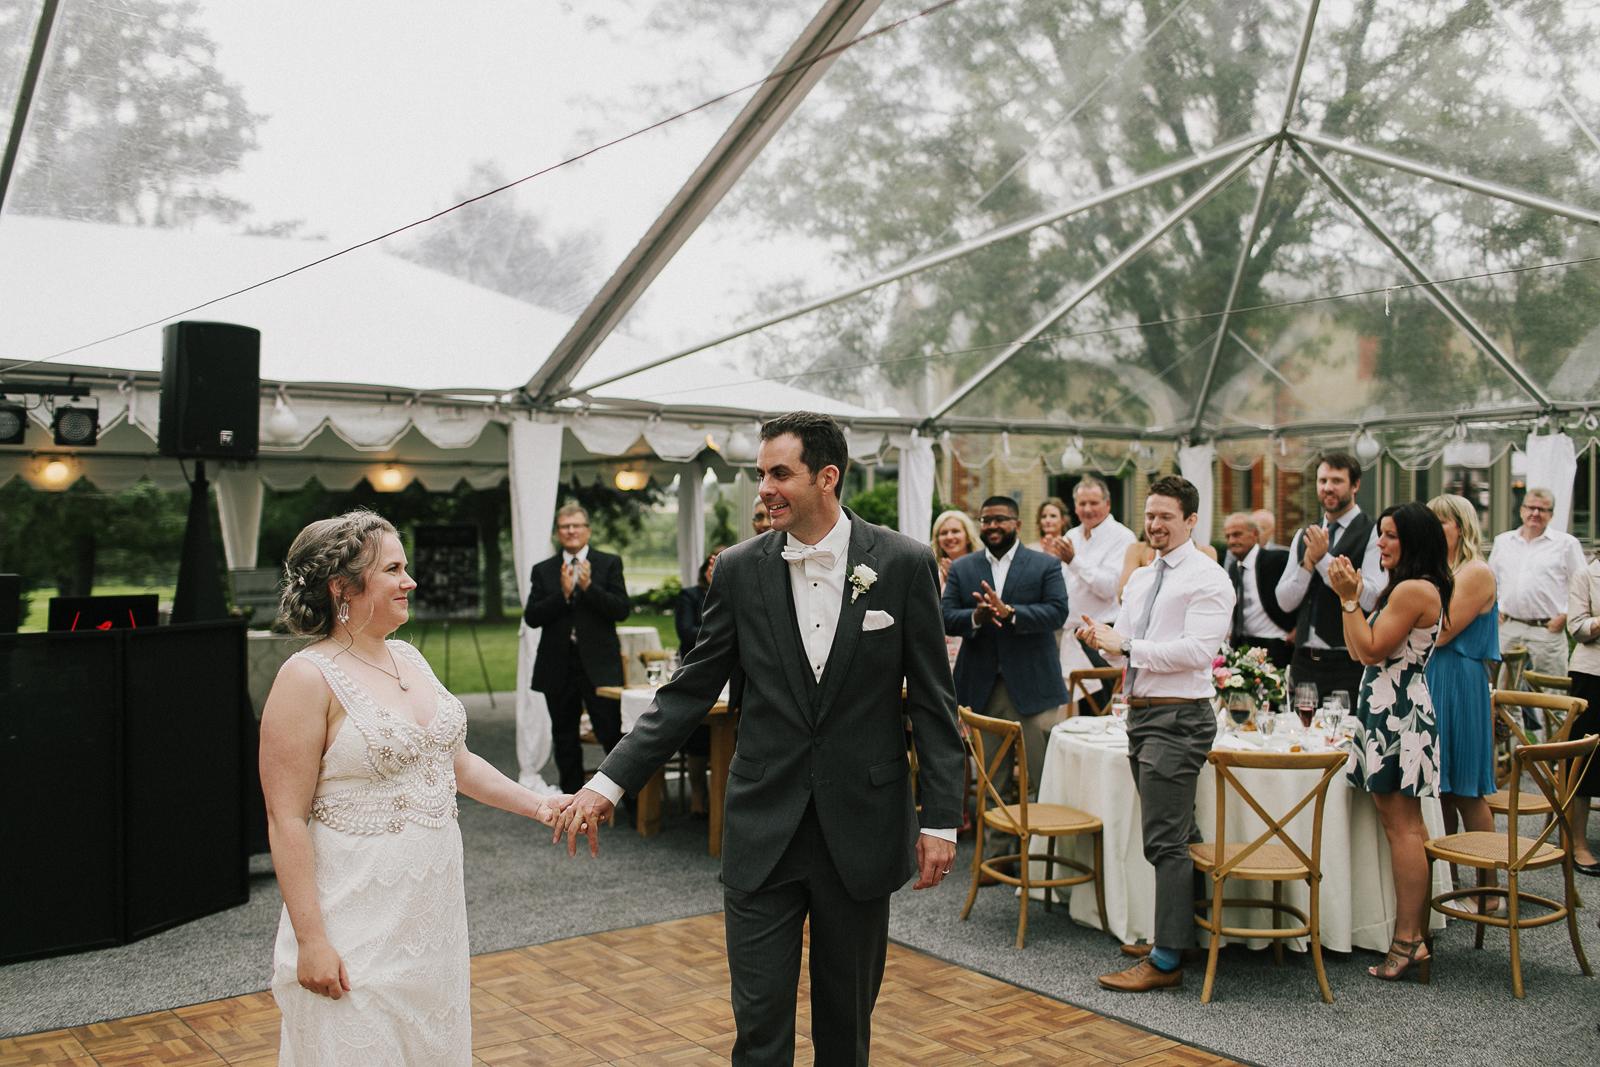 mike-and-jenni-wedding-420.jpg